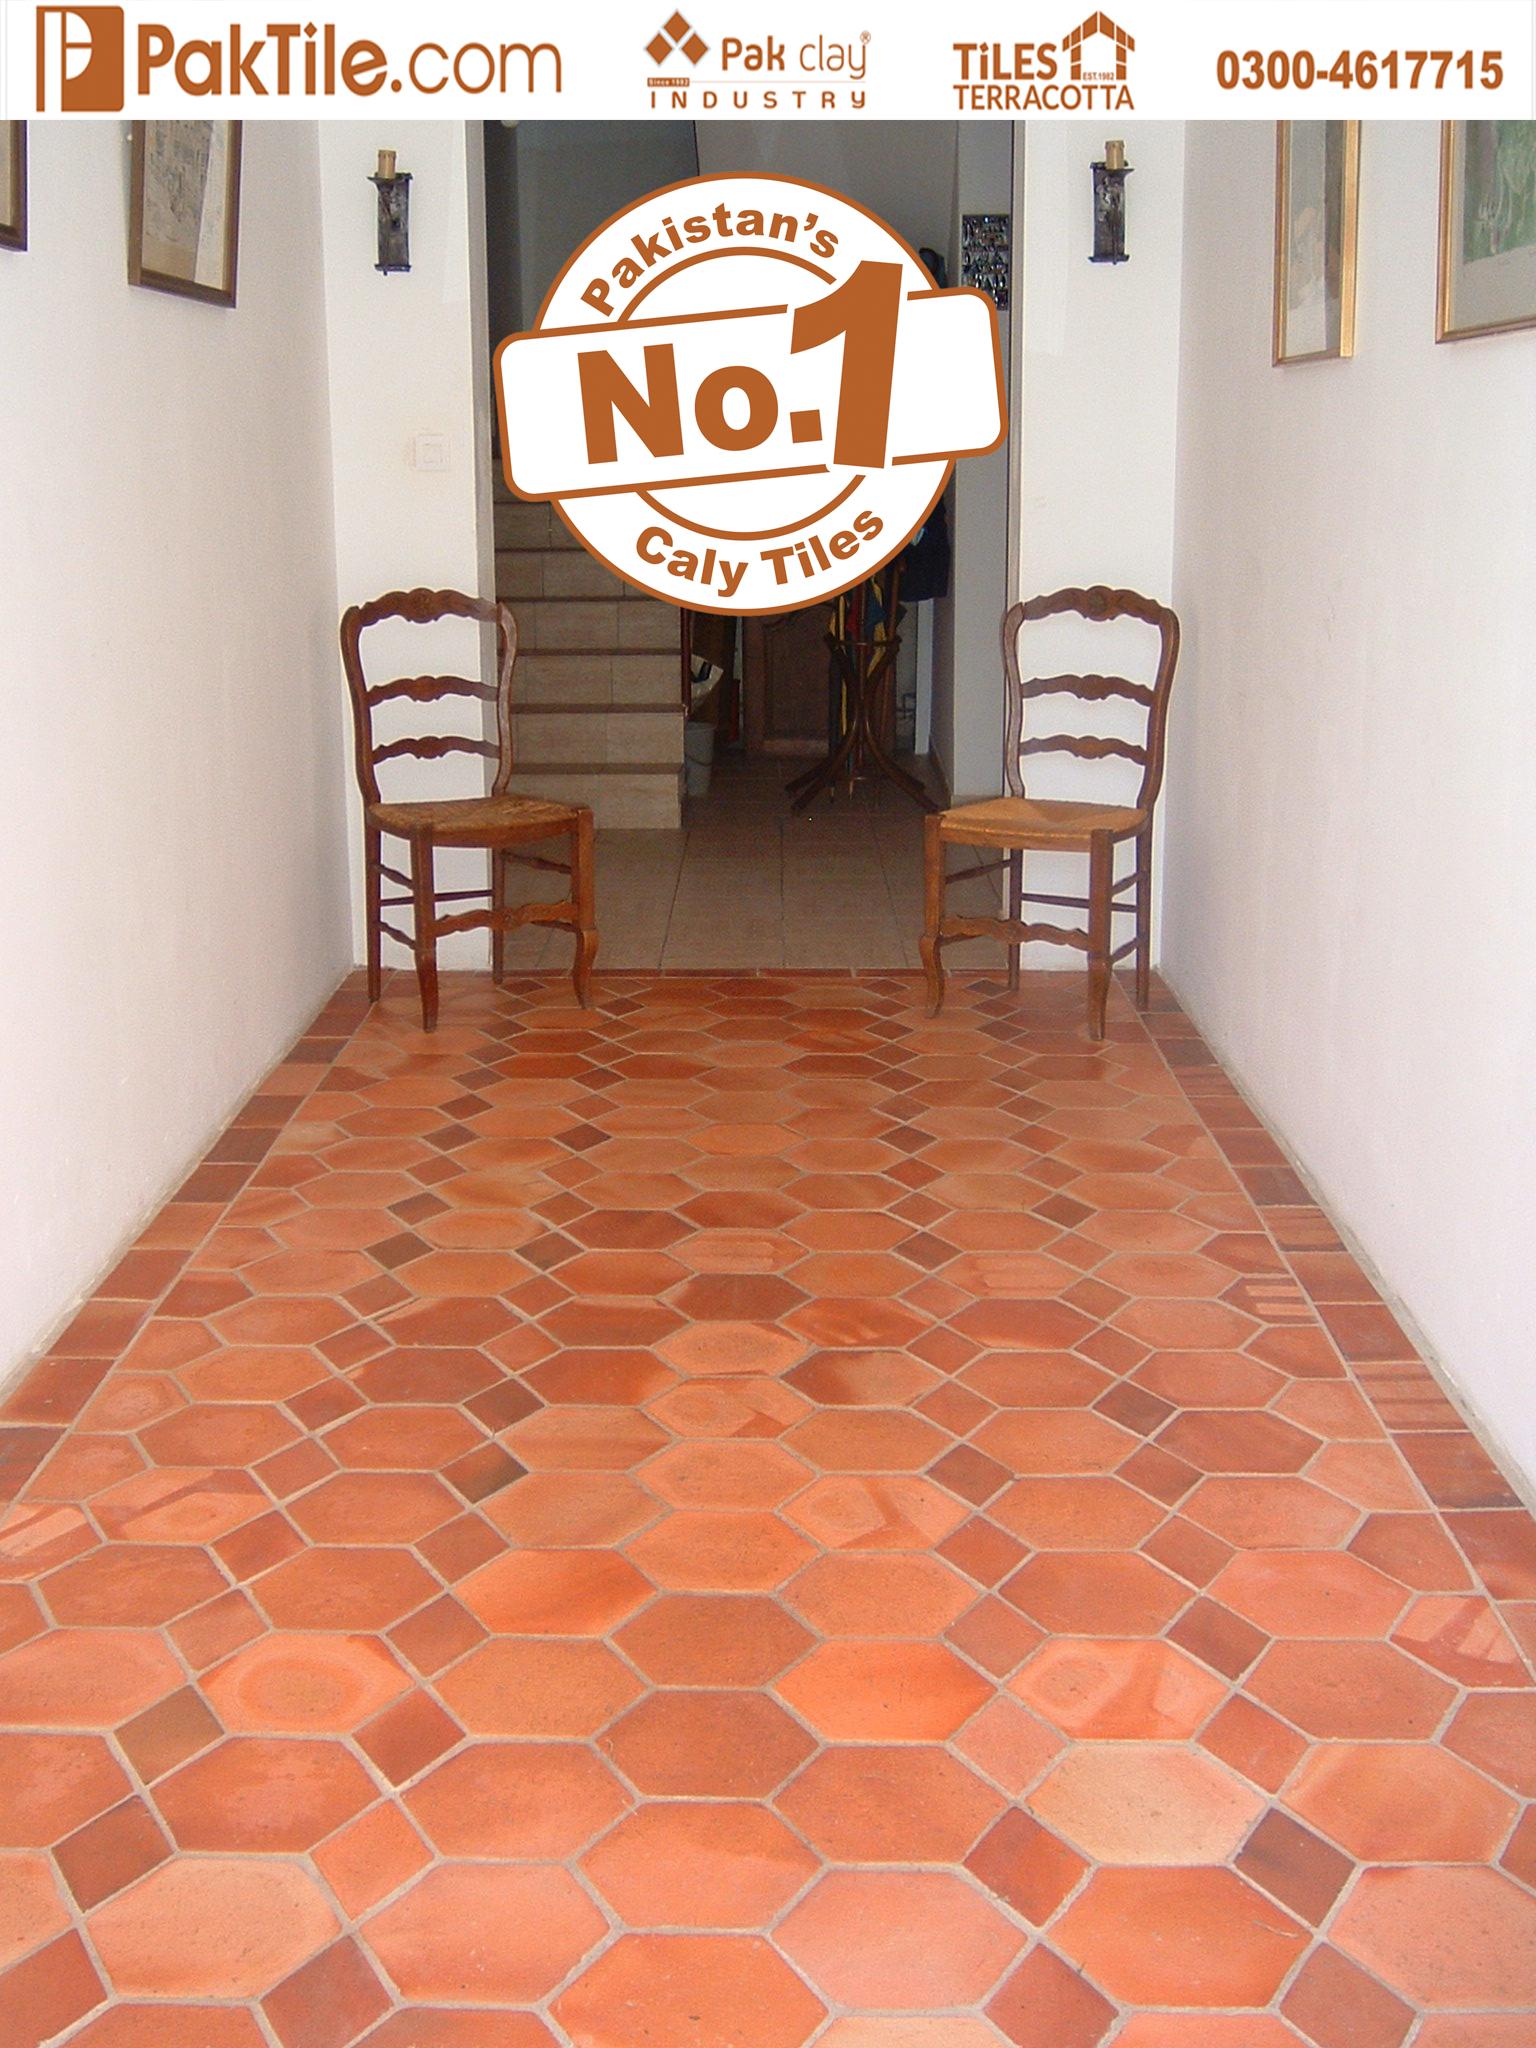 Pak Natural Clay Tiles Industry Terracotta Floor Tiles in Lahore